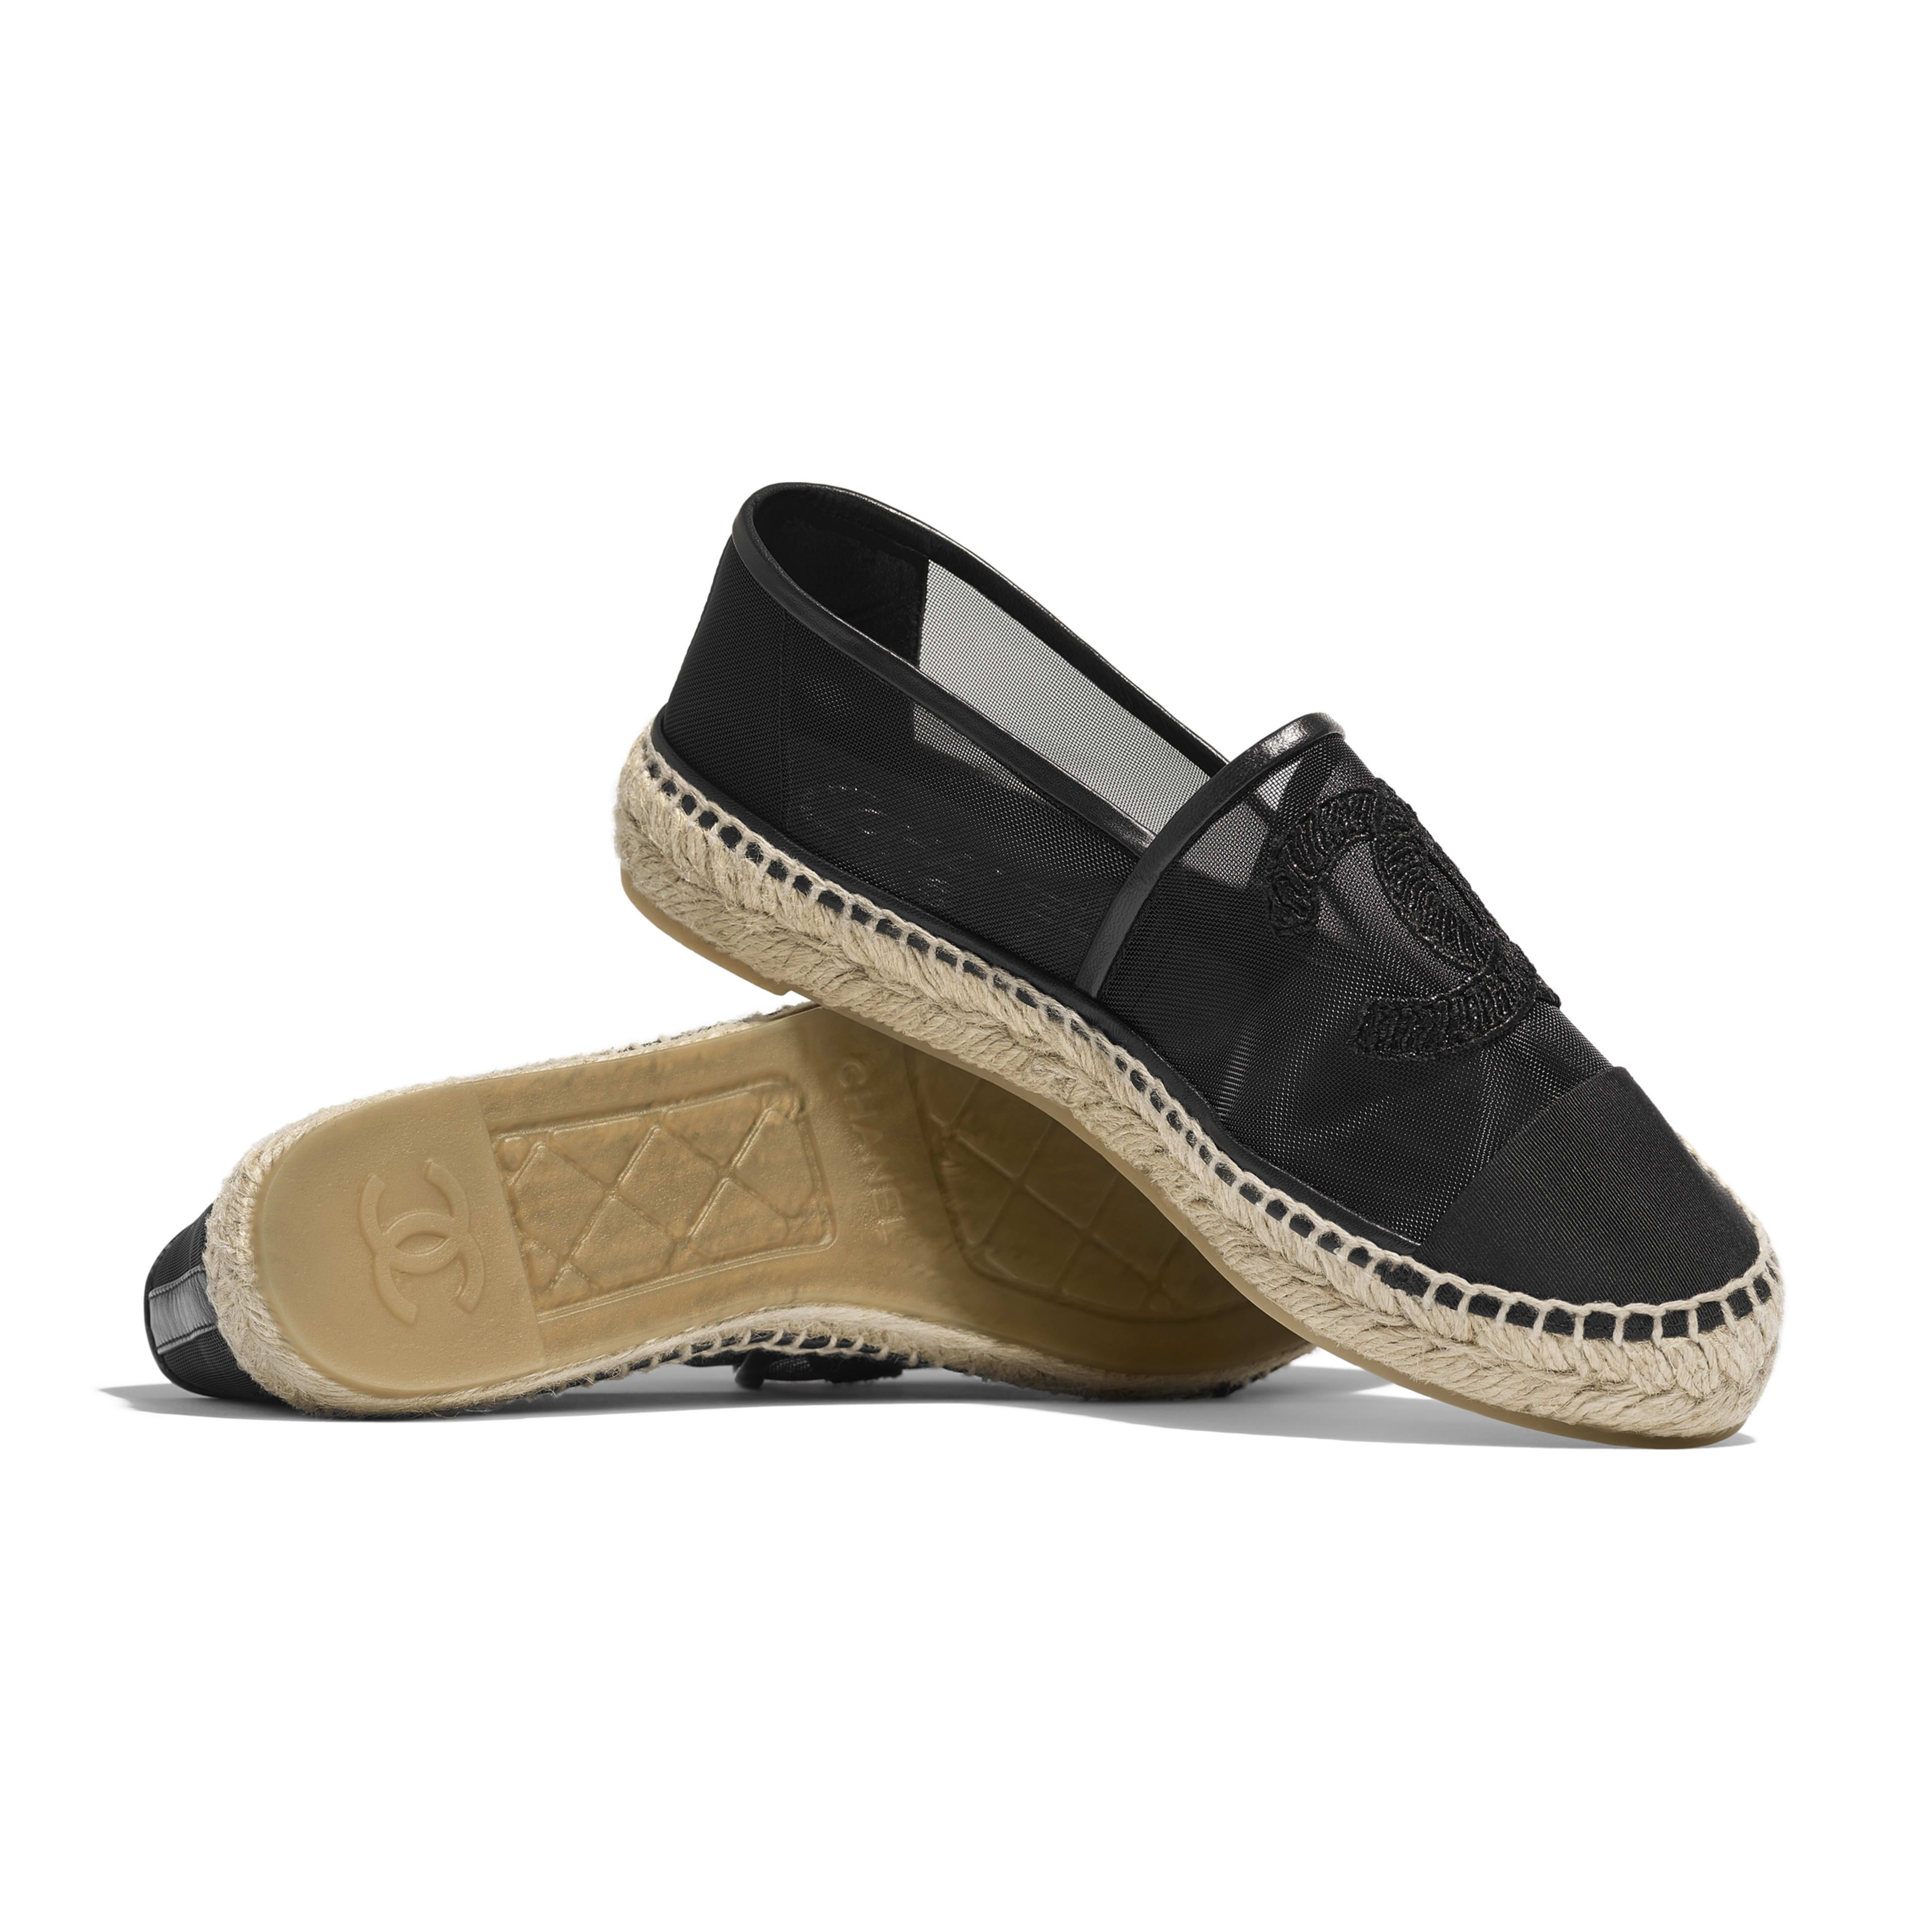 Fashion shoes, Chanel, Espadrilles